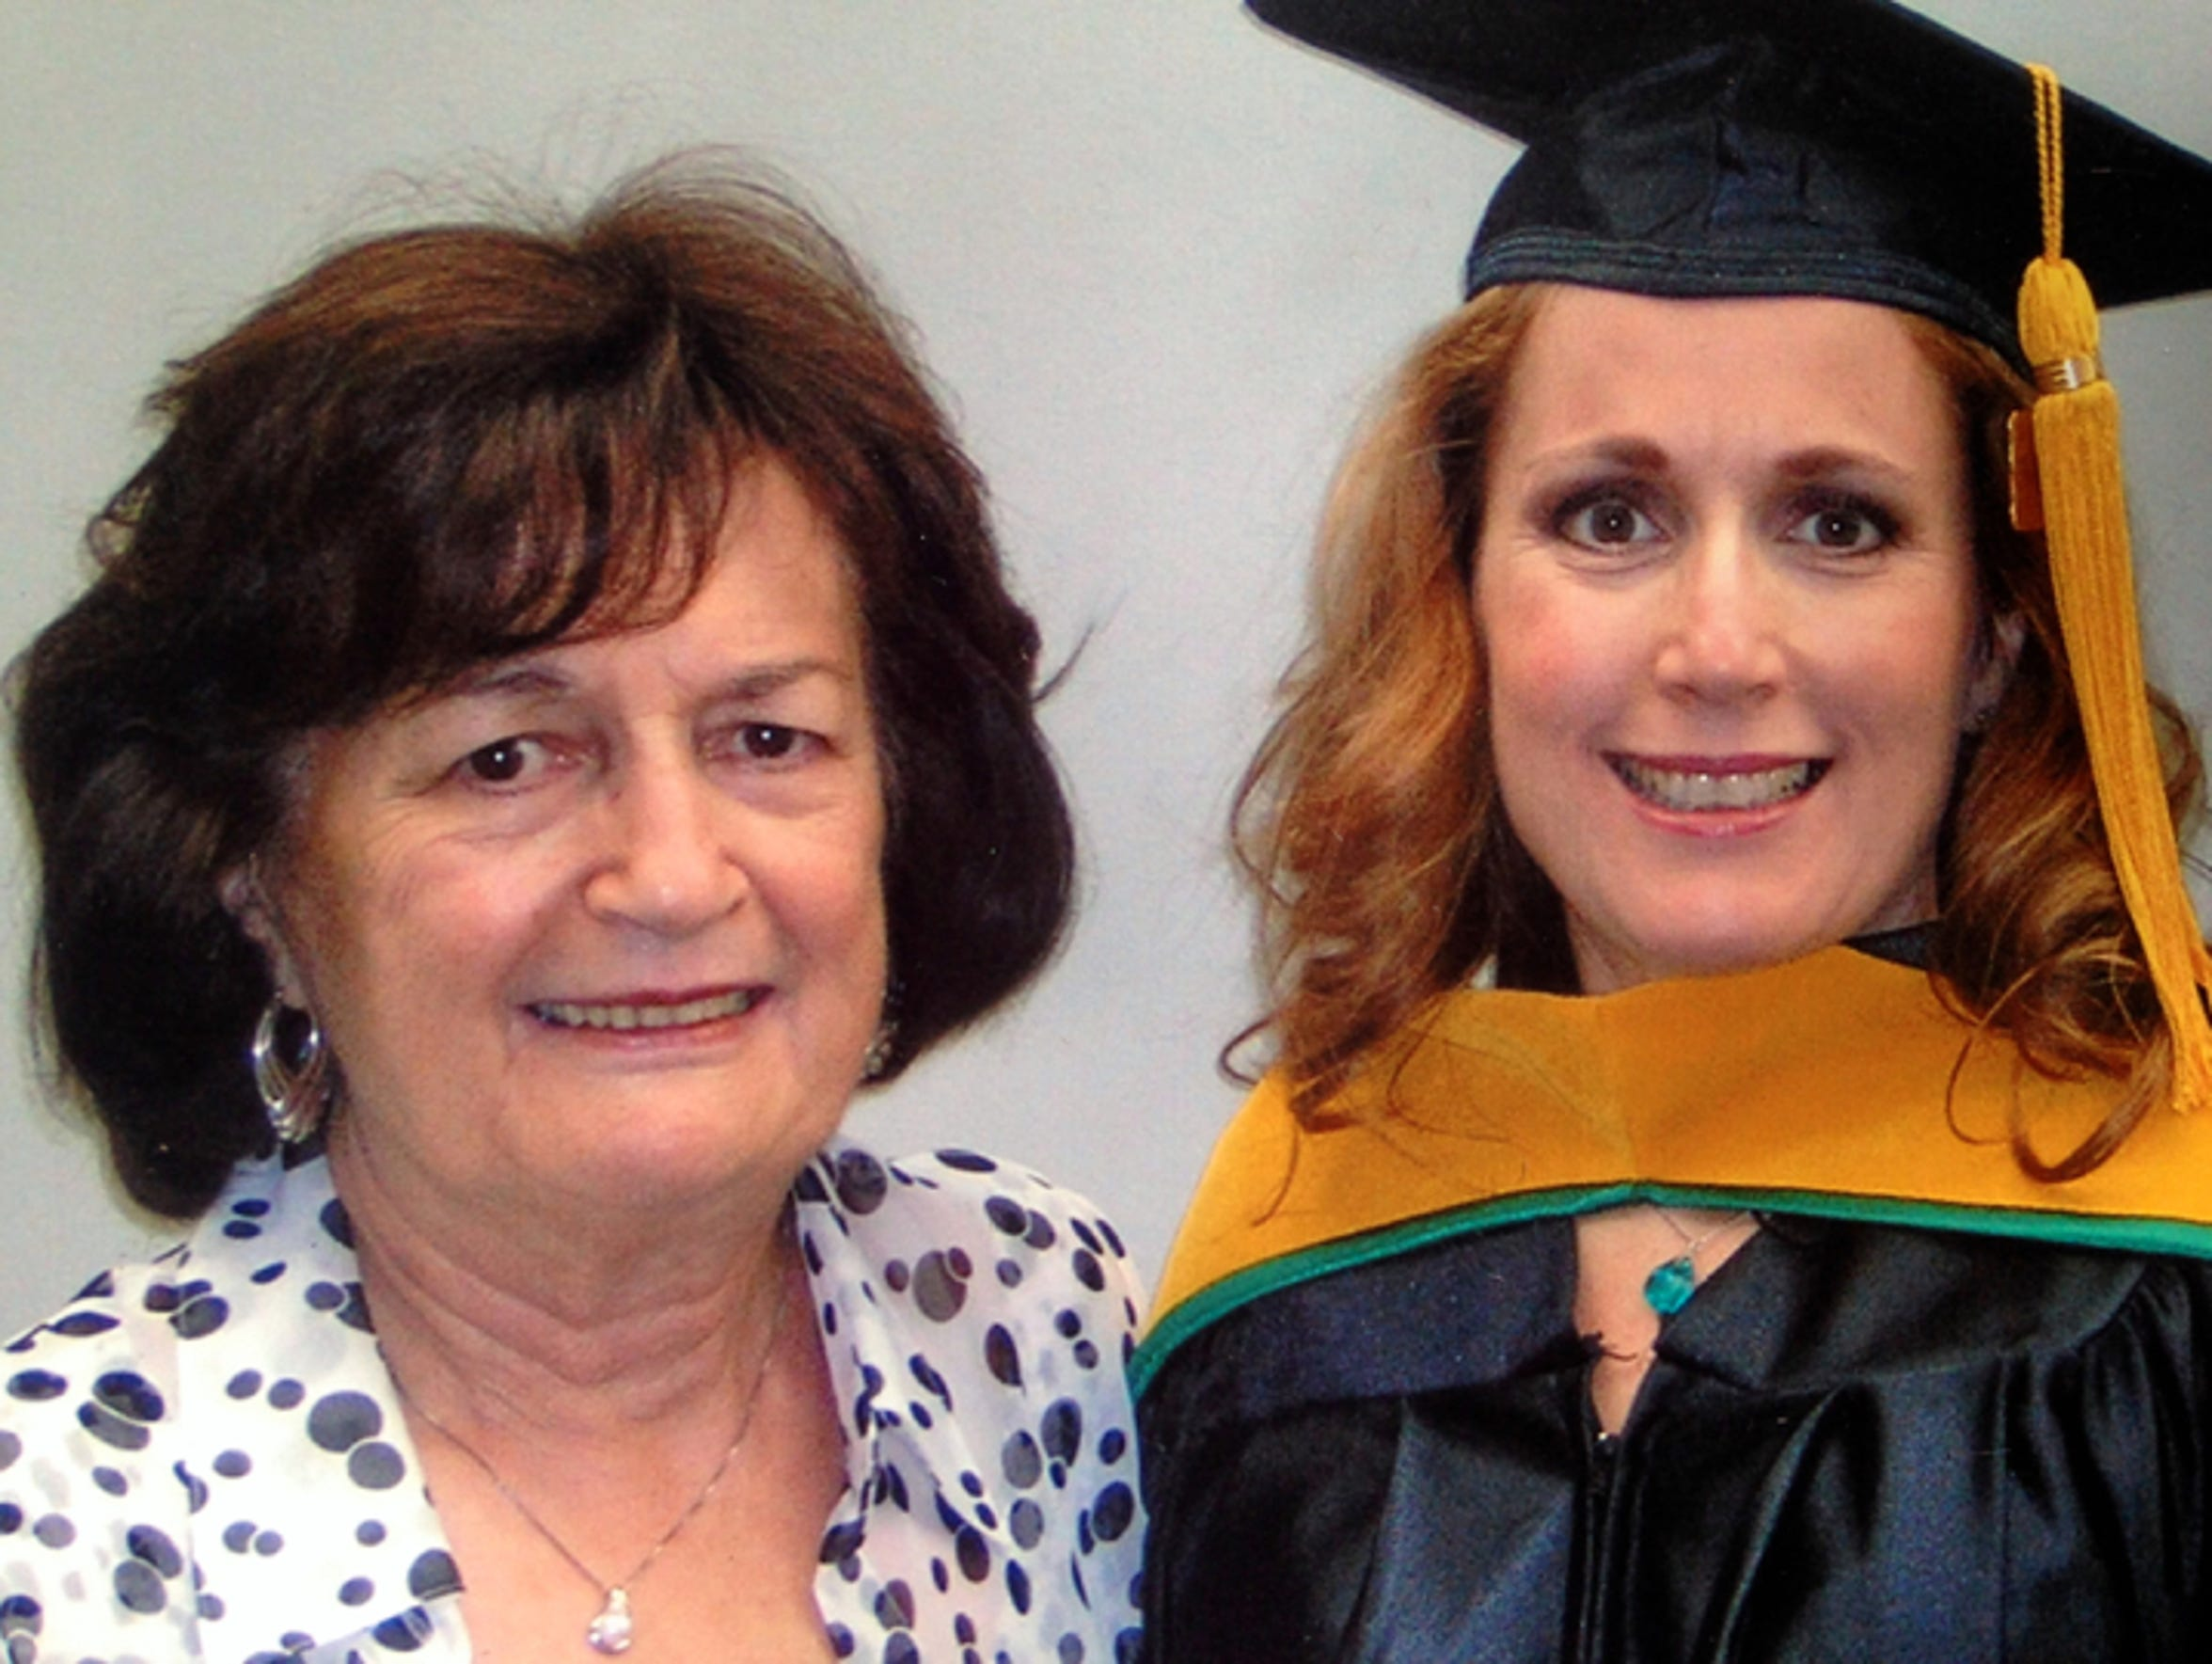 Teresa and her mom celebrating graduation